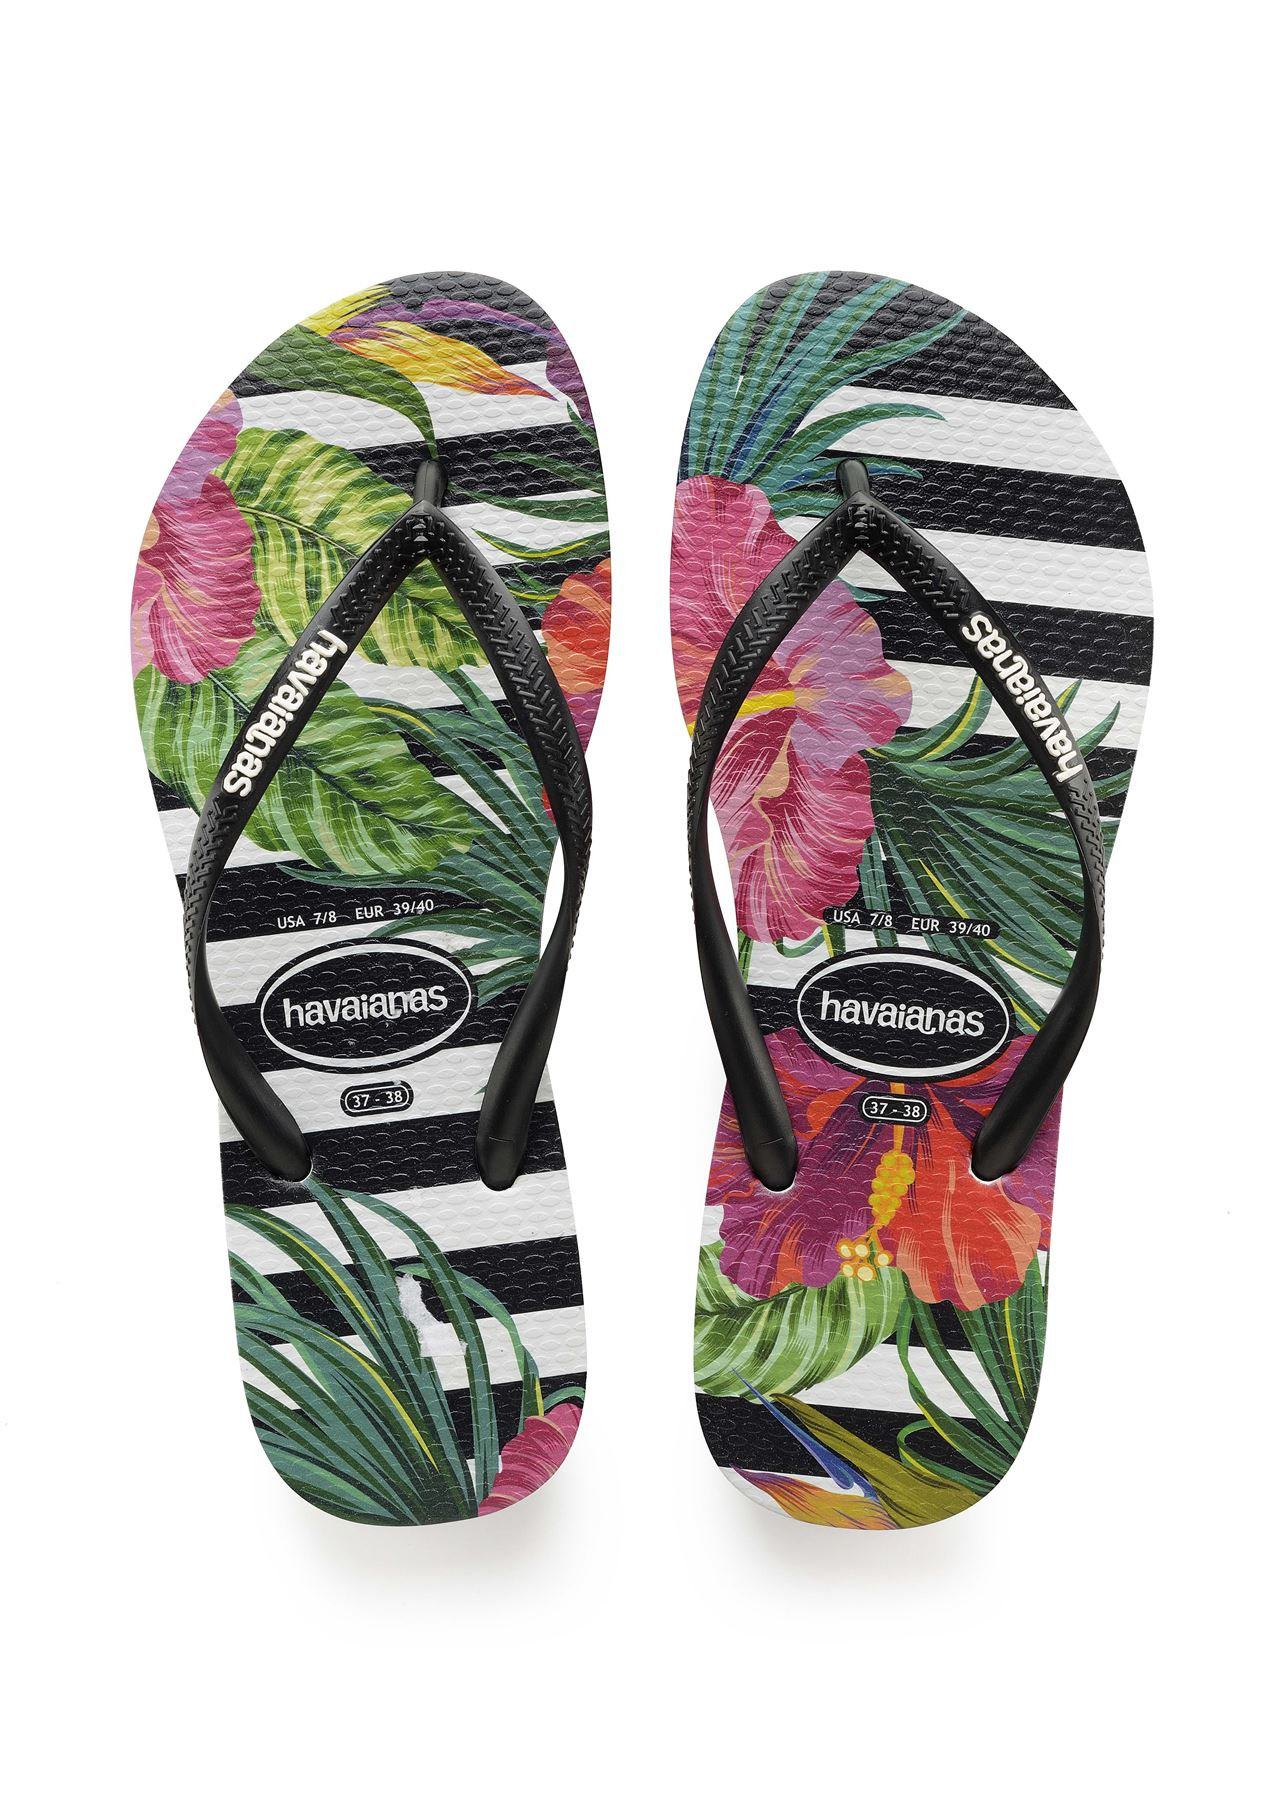 Havaianas Slim Tropical /& Floral Print Flip Flops Summer Beach Pool Sandals